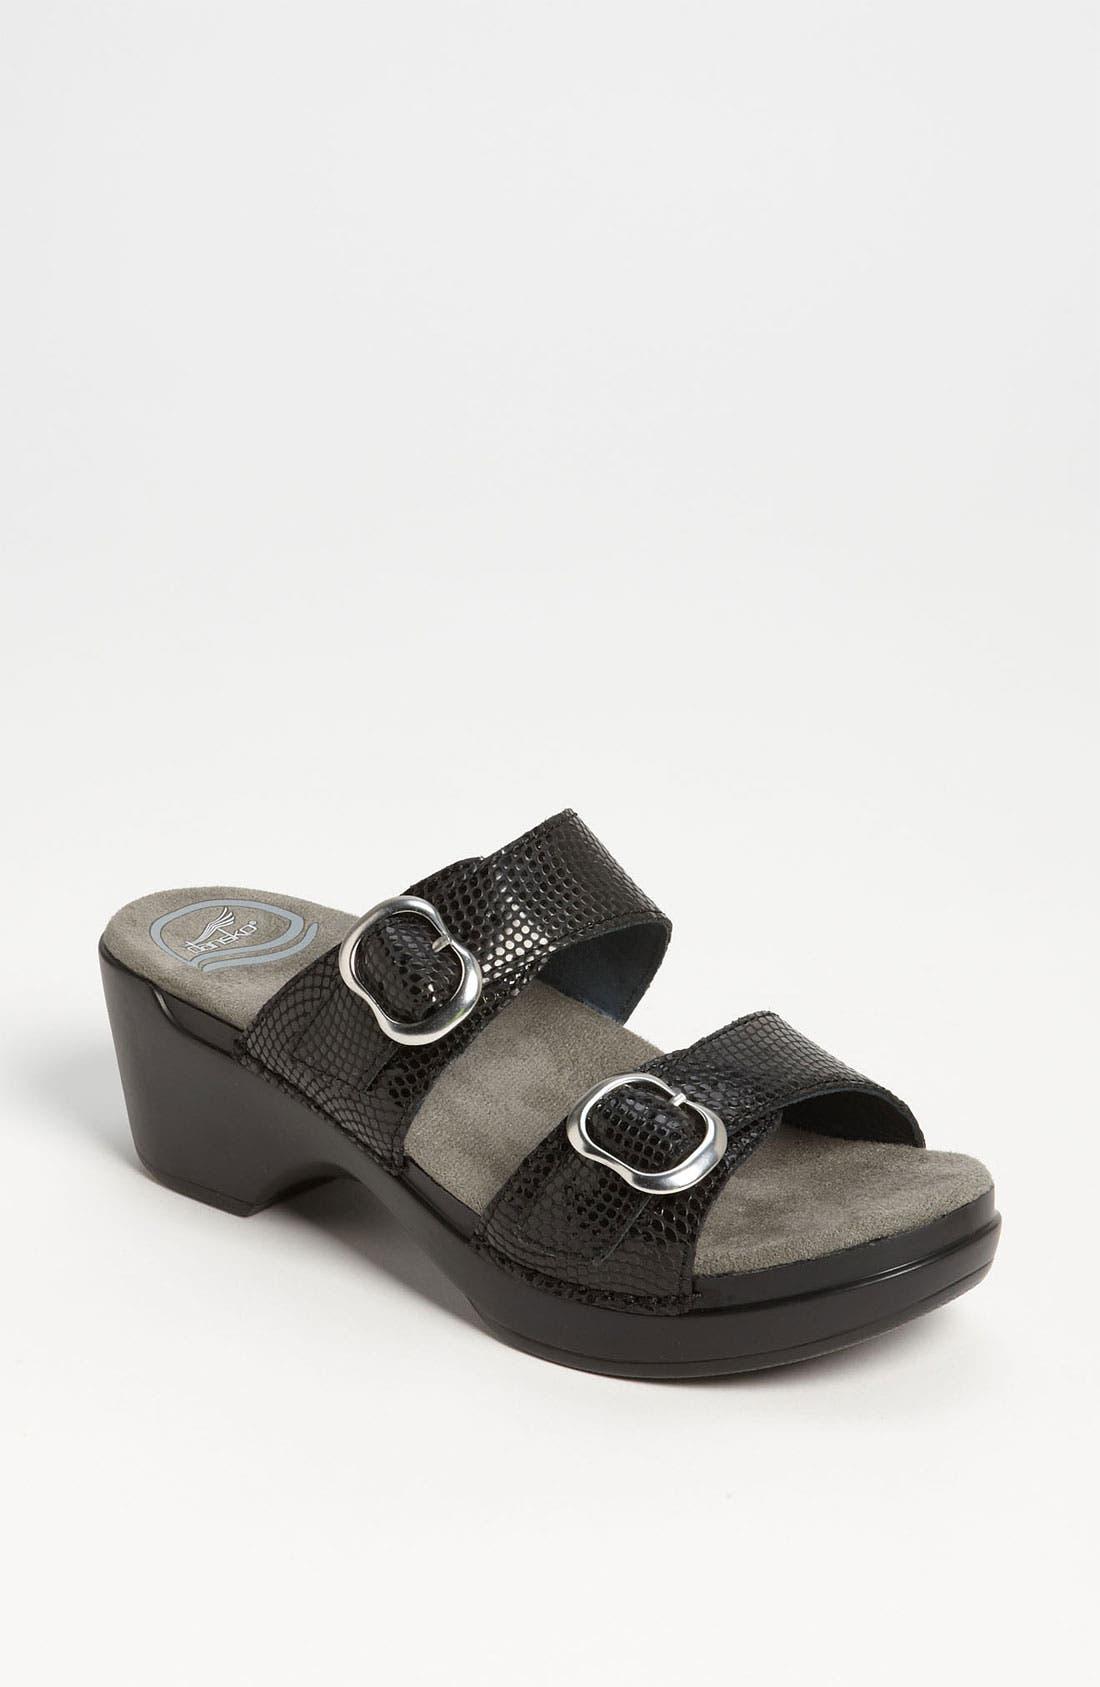 Alternate Image 1 Selected - Dansko 'Sophie' Sandal